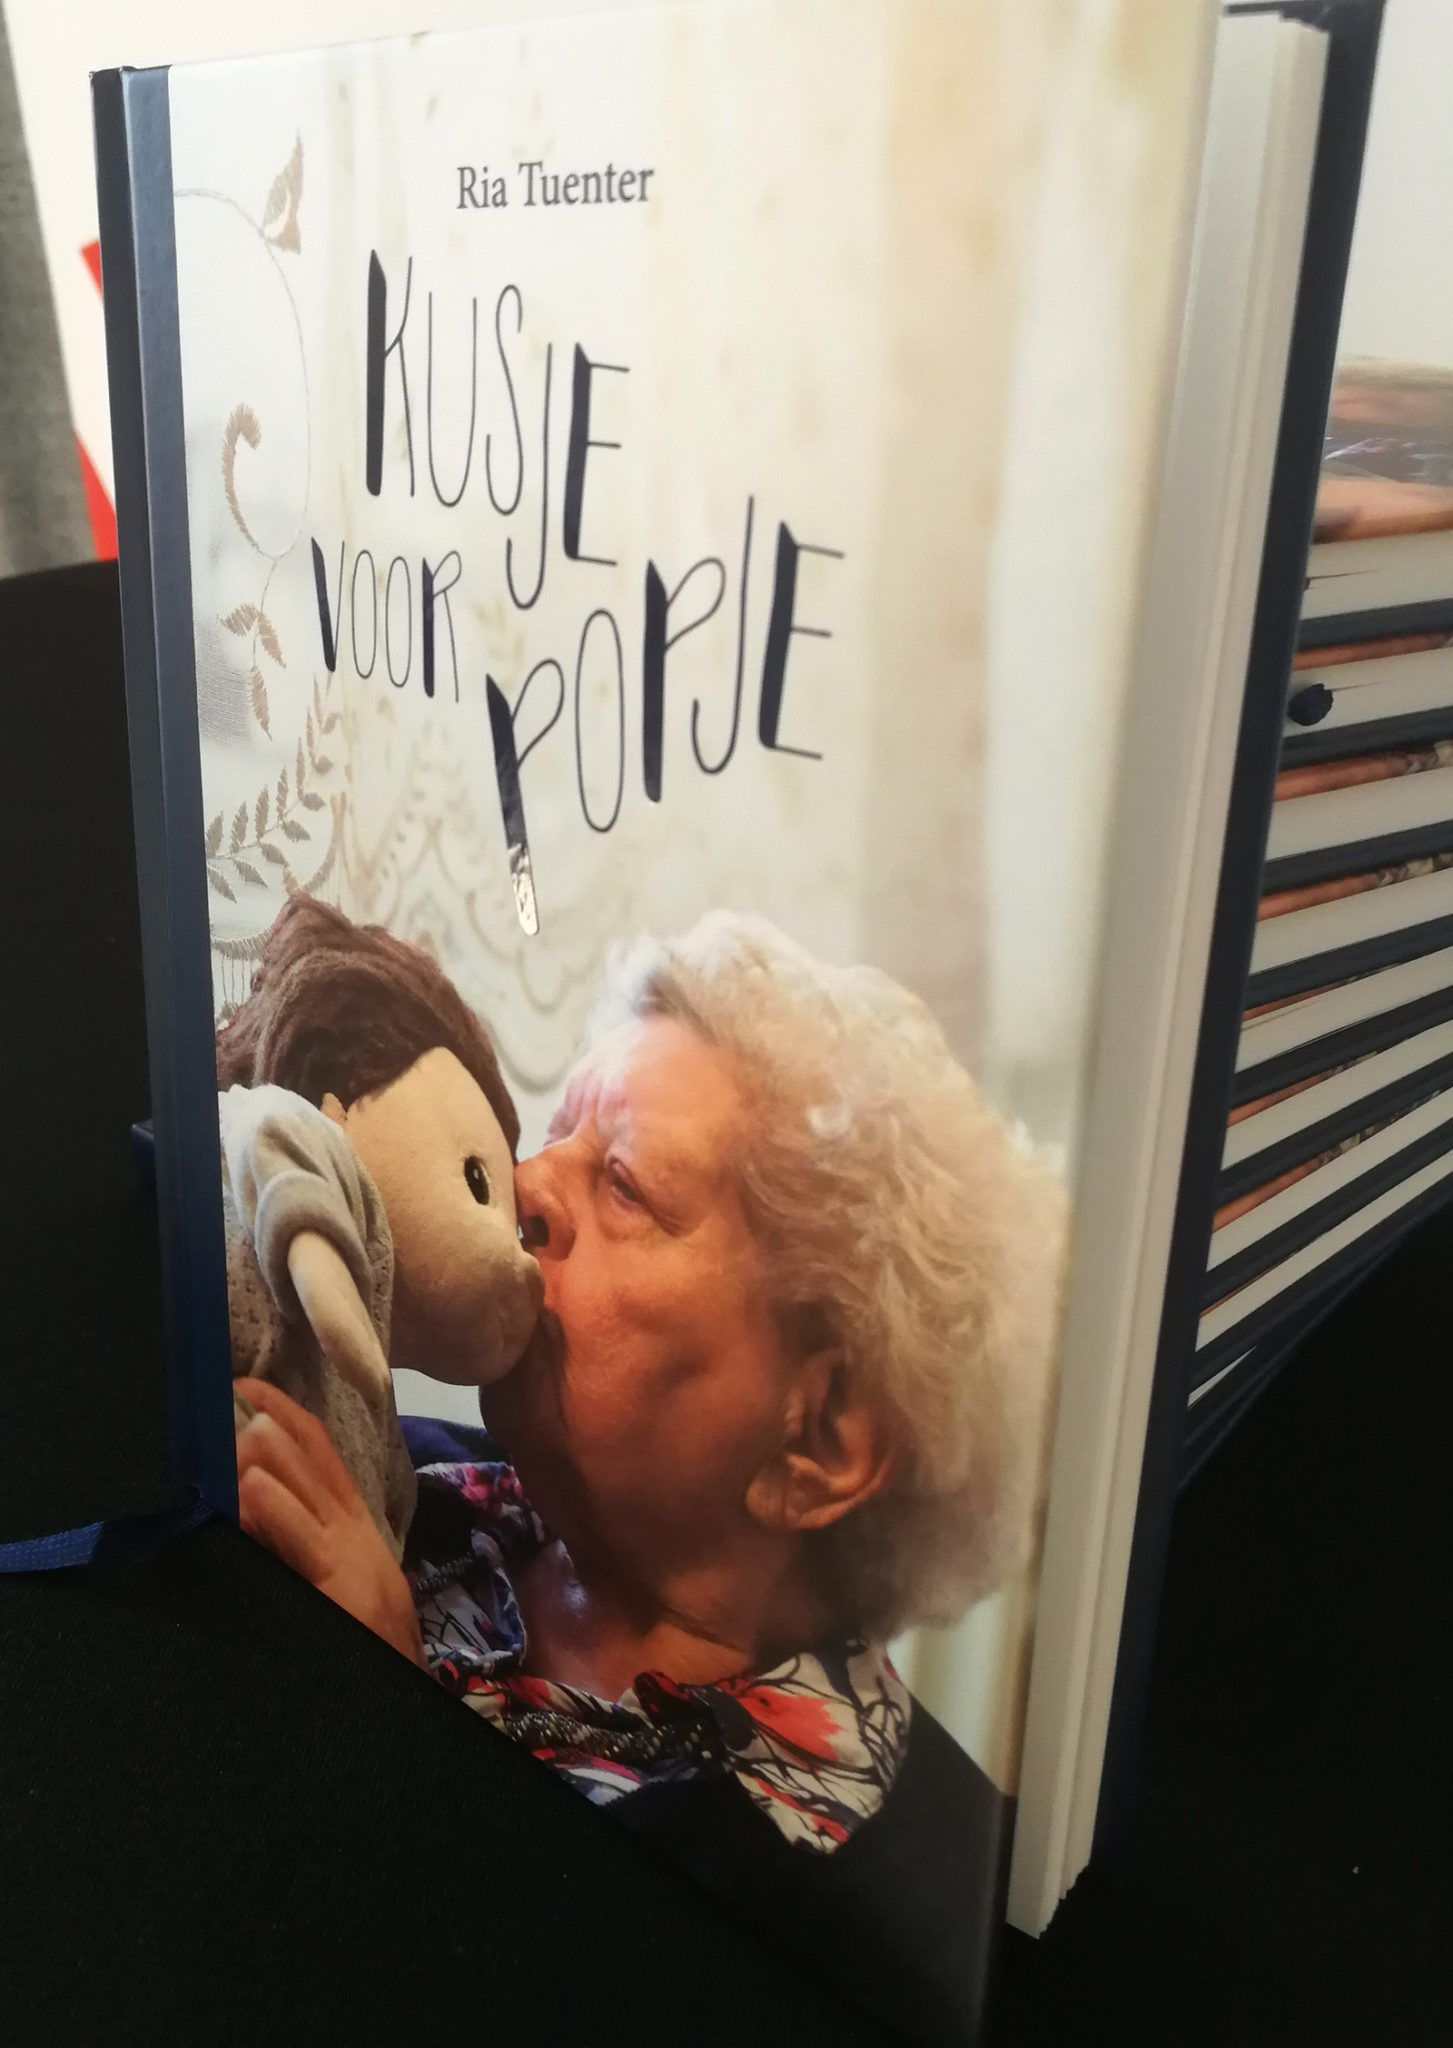 Kusje voor Popje - Ria Tuenter